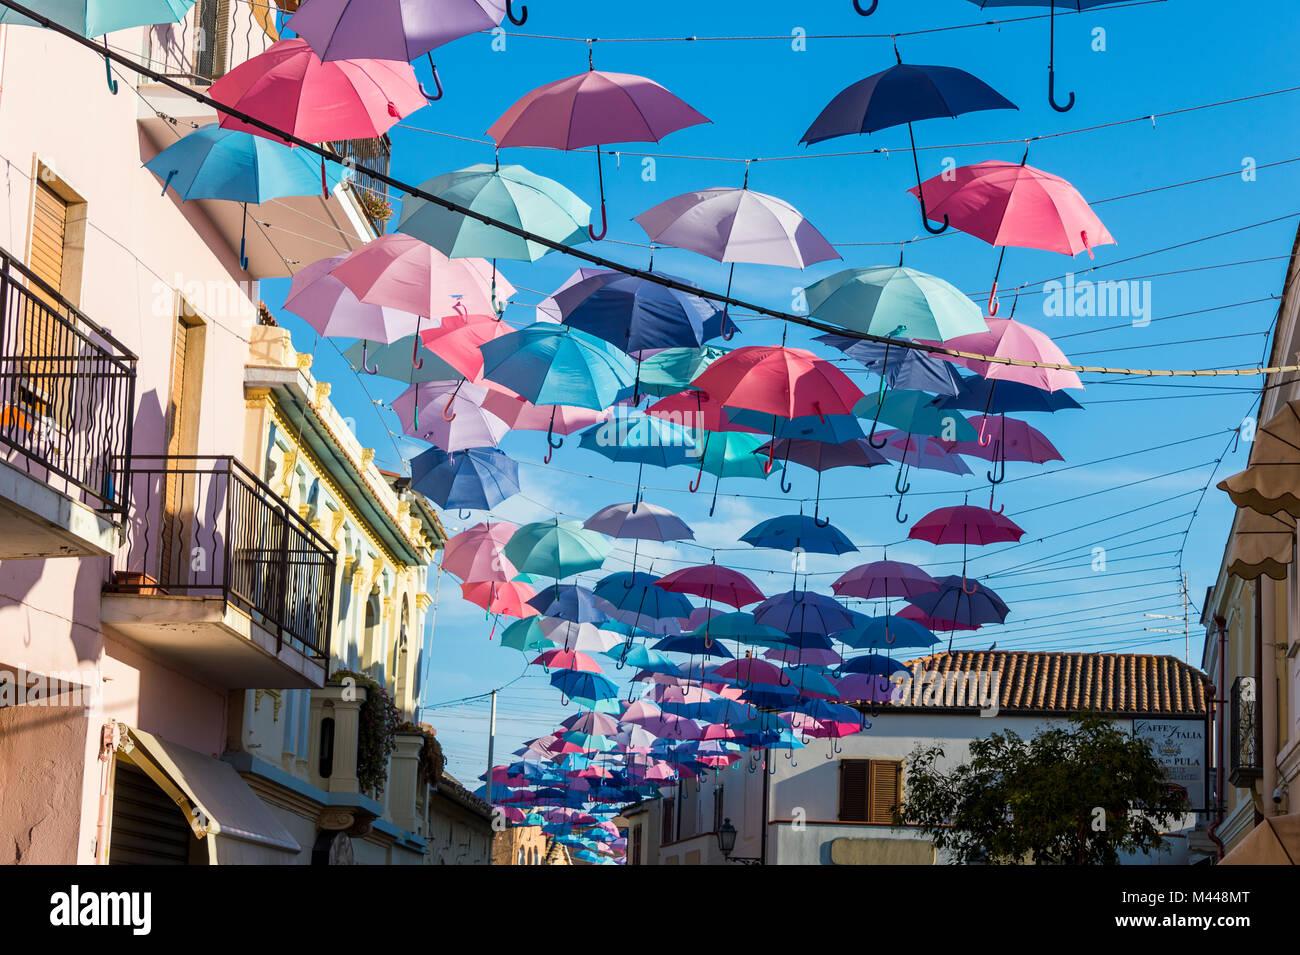 Umbrellas Street in Pula,Sardinia,Italy - Stock Image